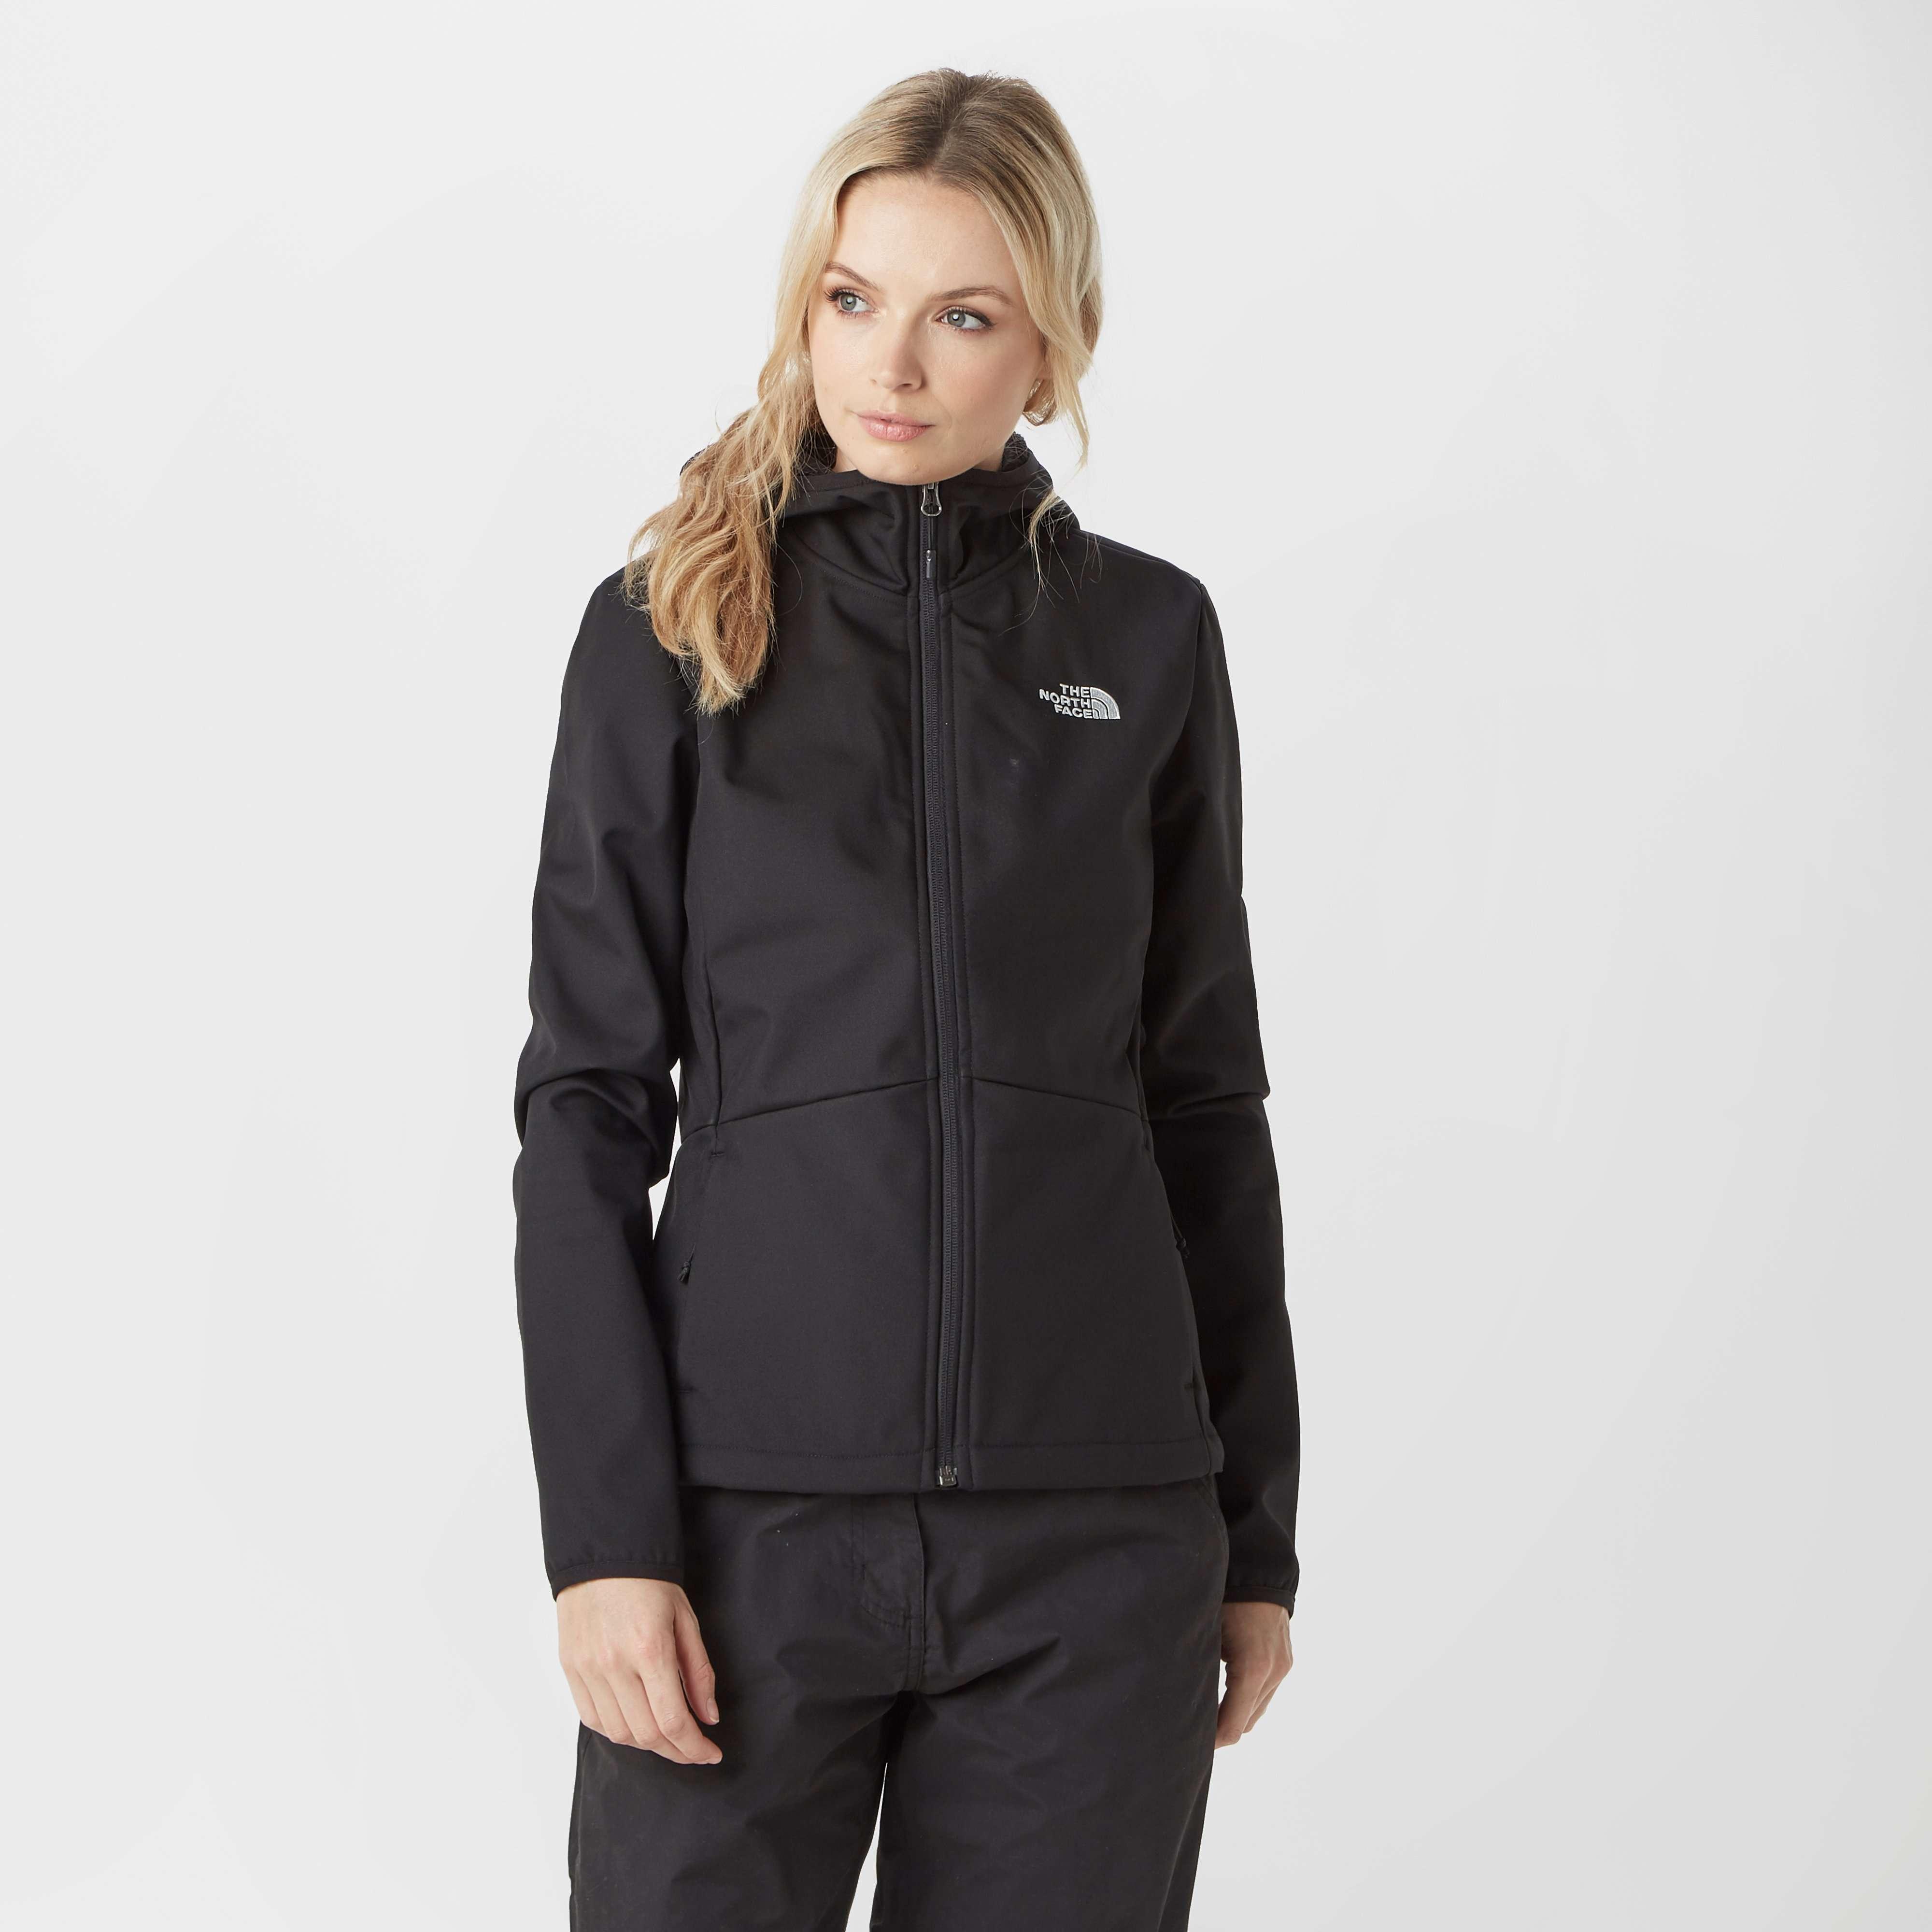 THE NORTH FACE Women's Tanken Softshell Jacket